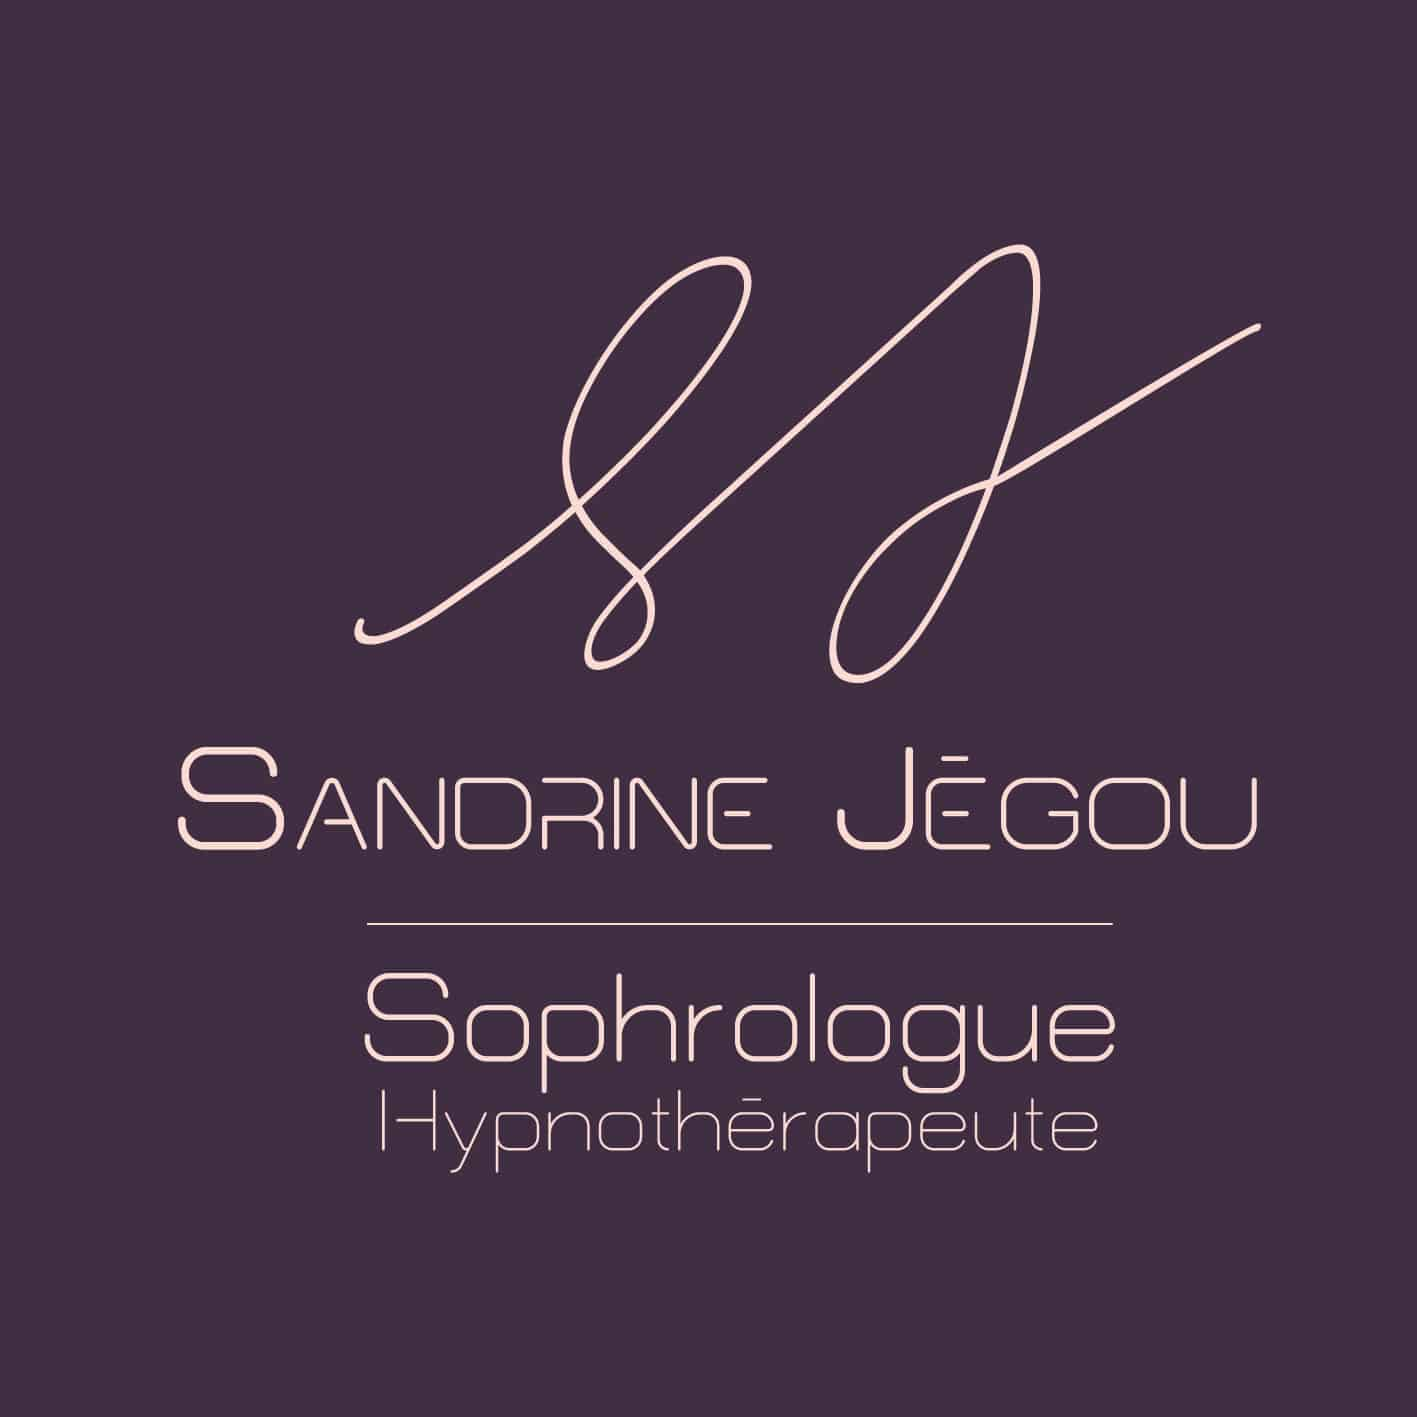 logo-sandrine-jegou